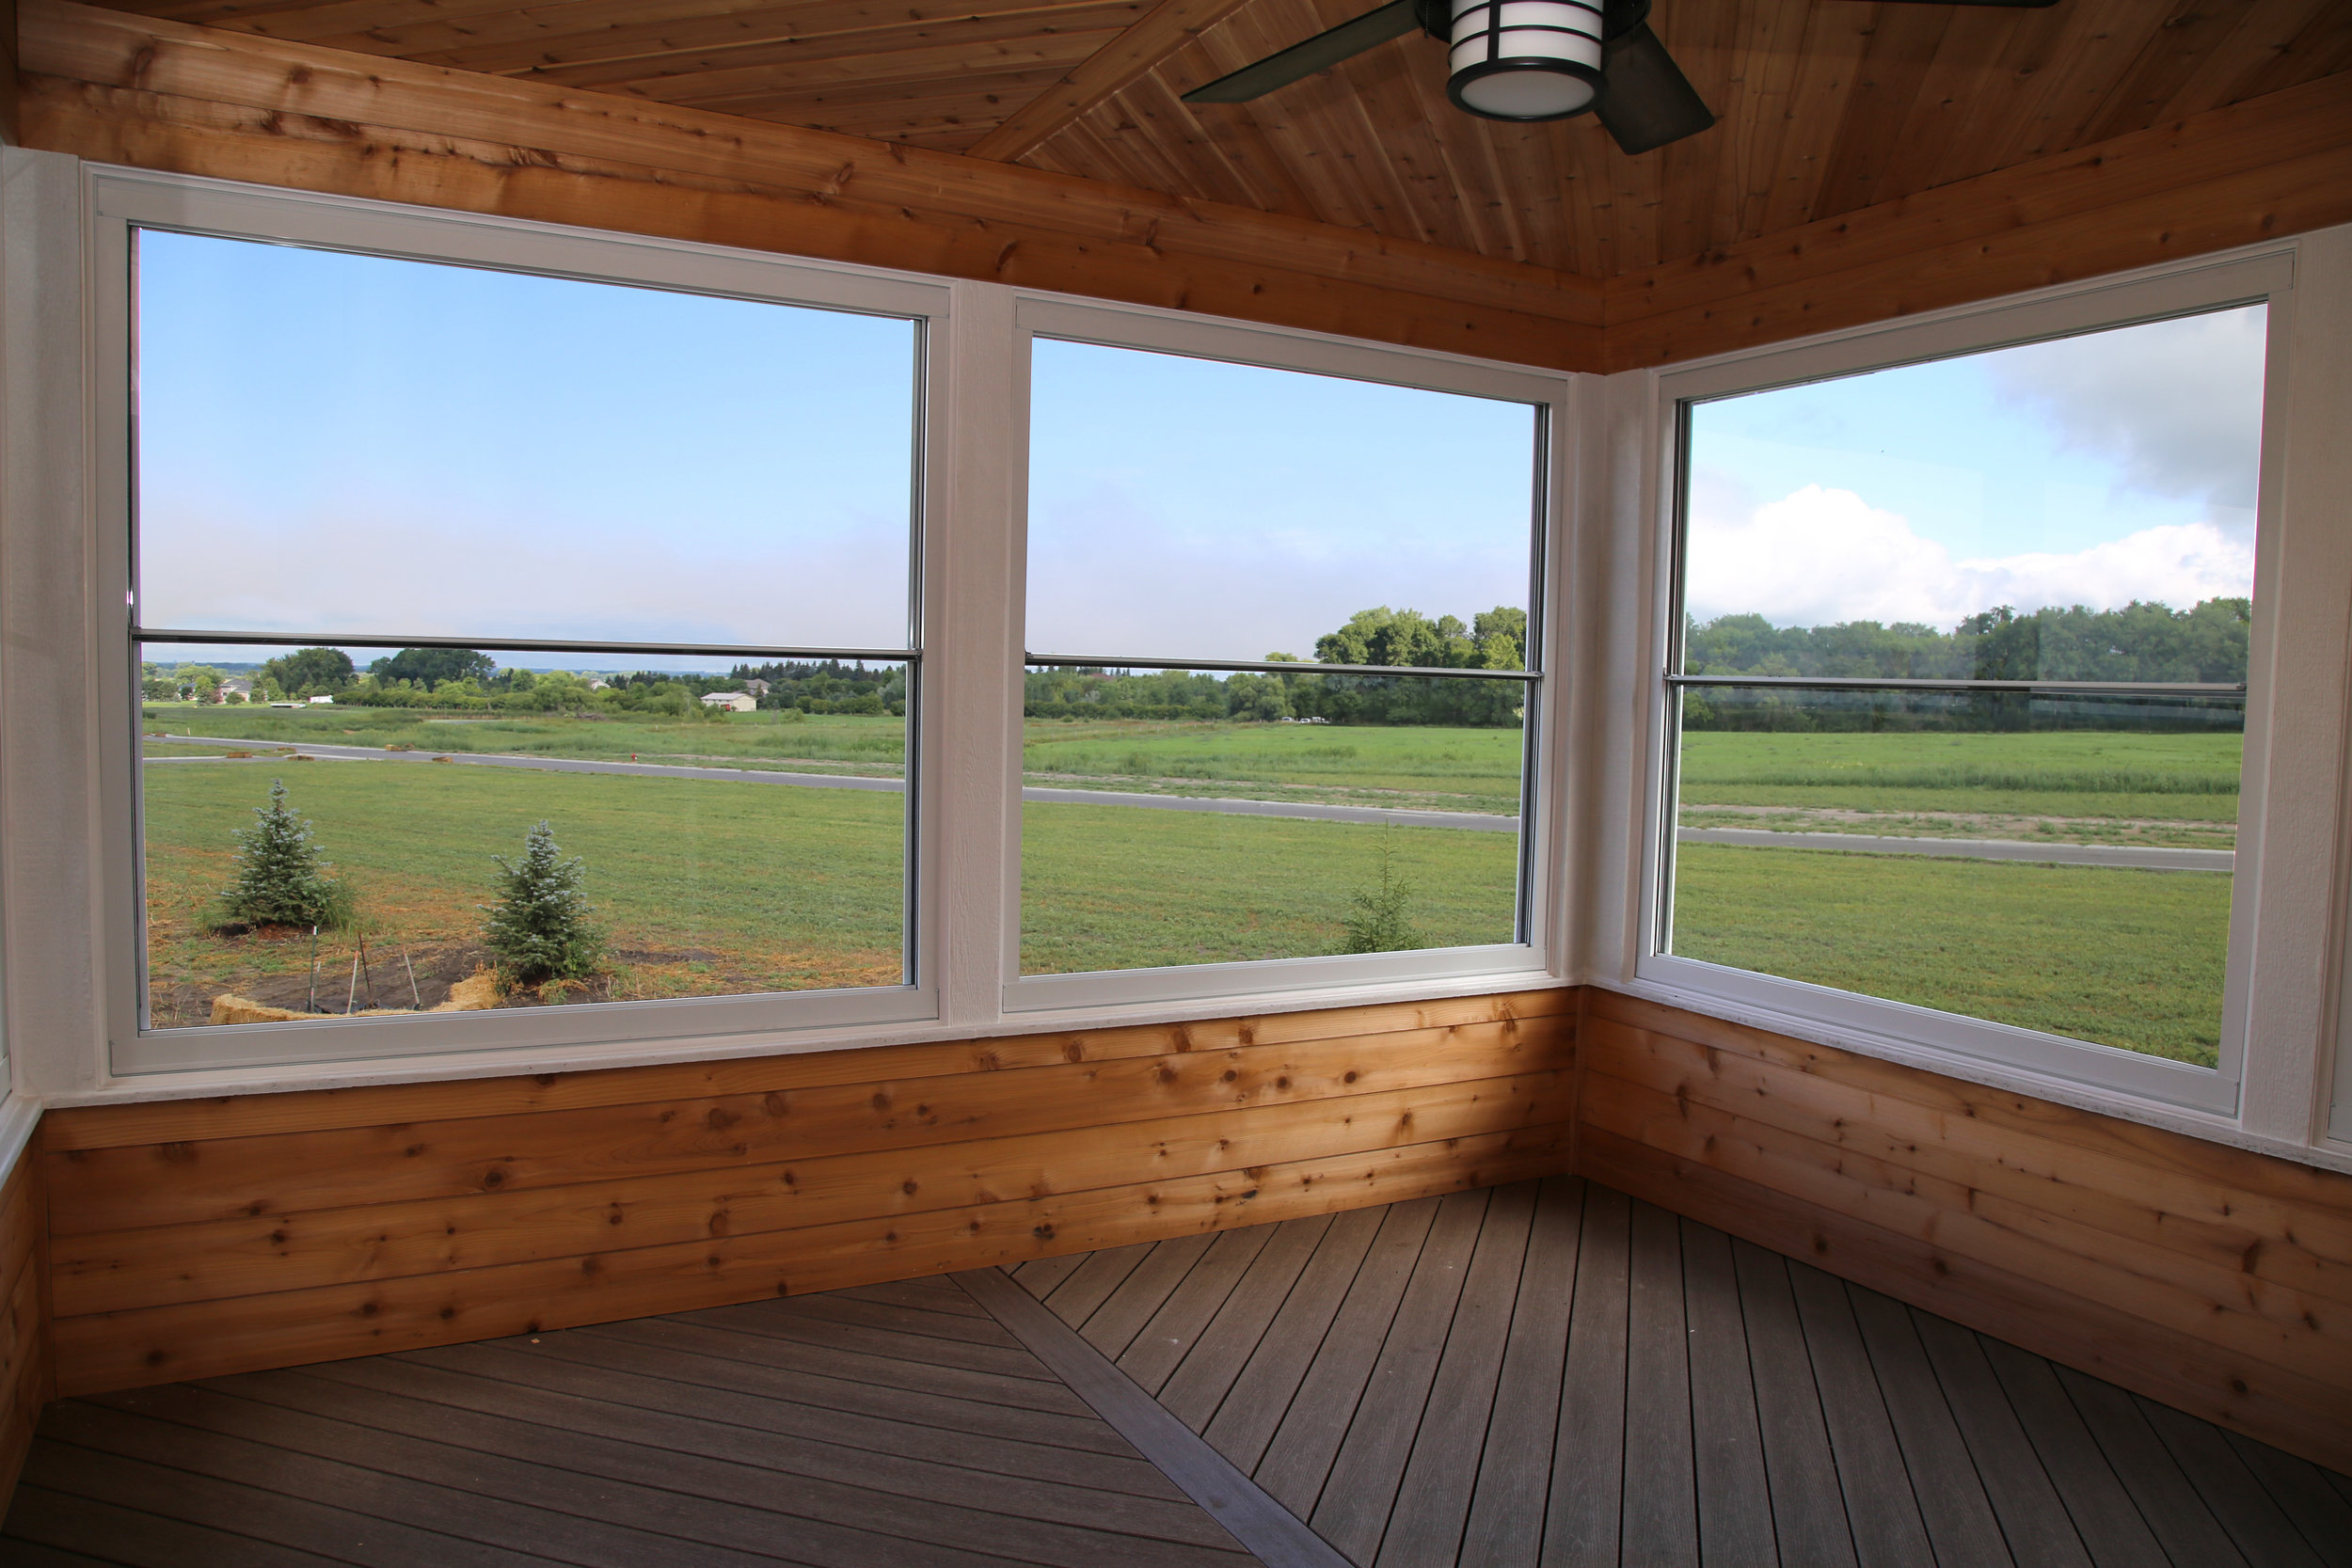 New Expanse Windows in Custom Home   Photo courtesy of Larson Windows & Doors